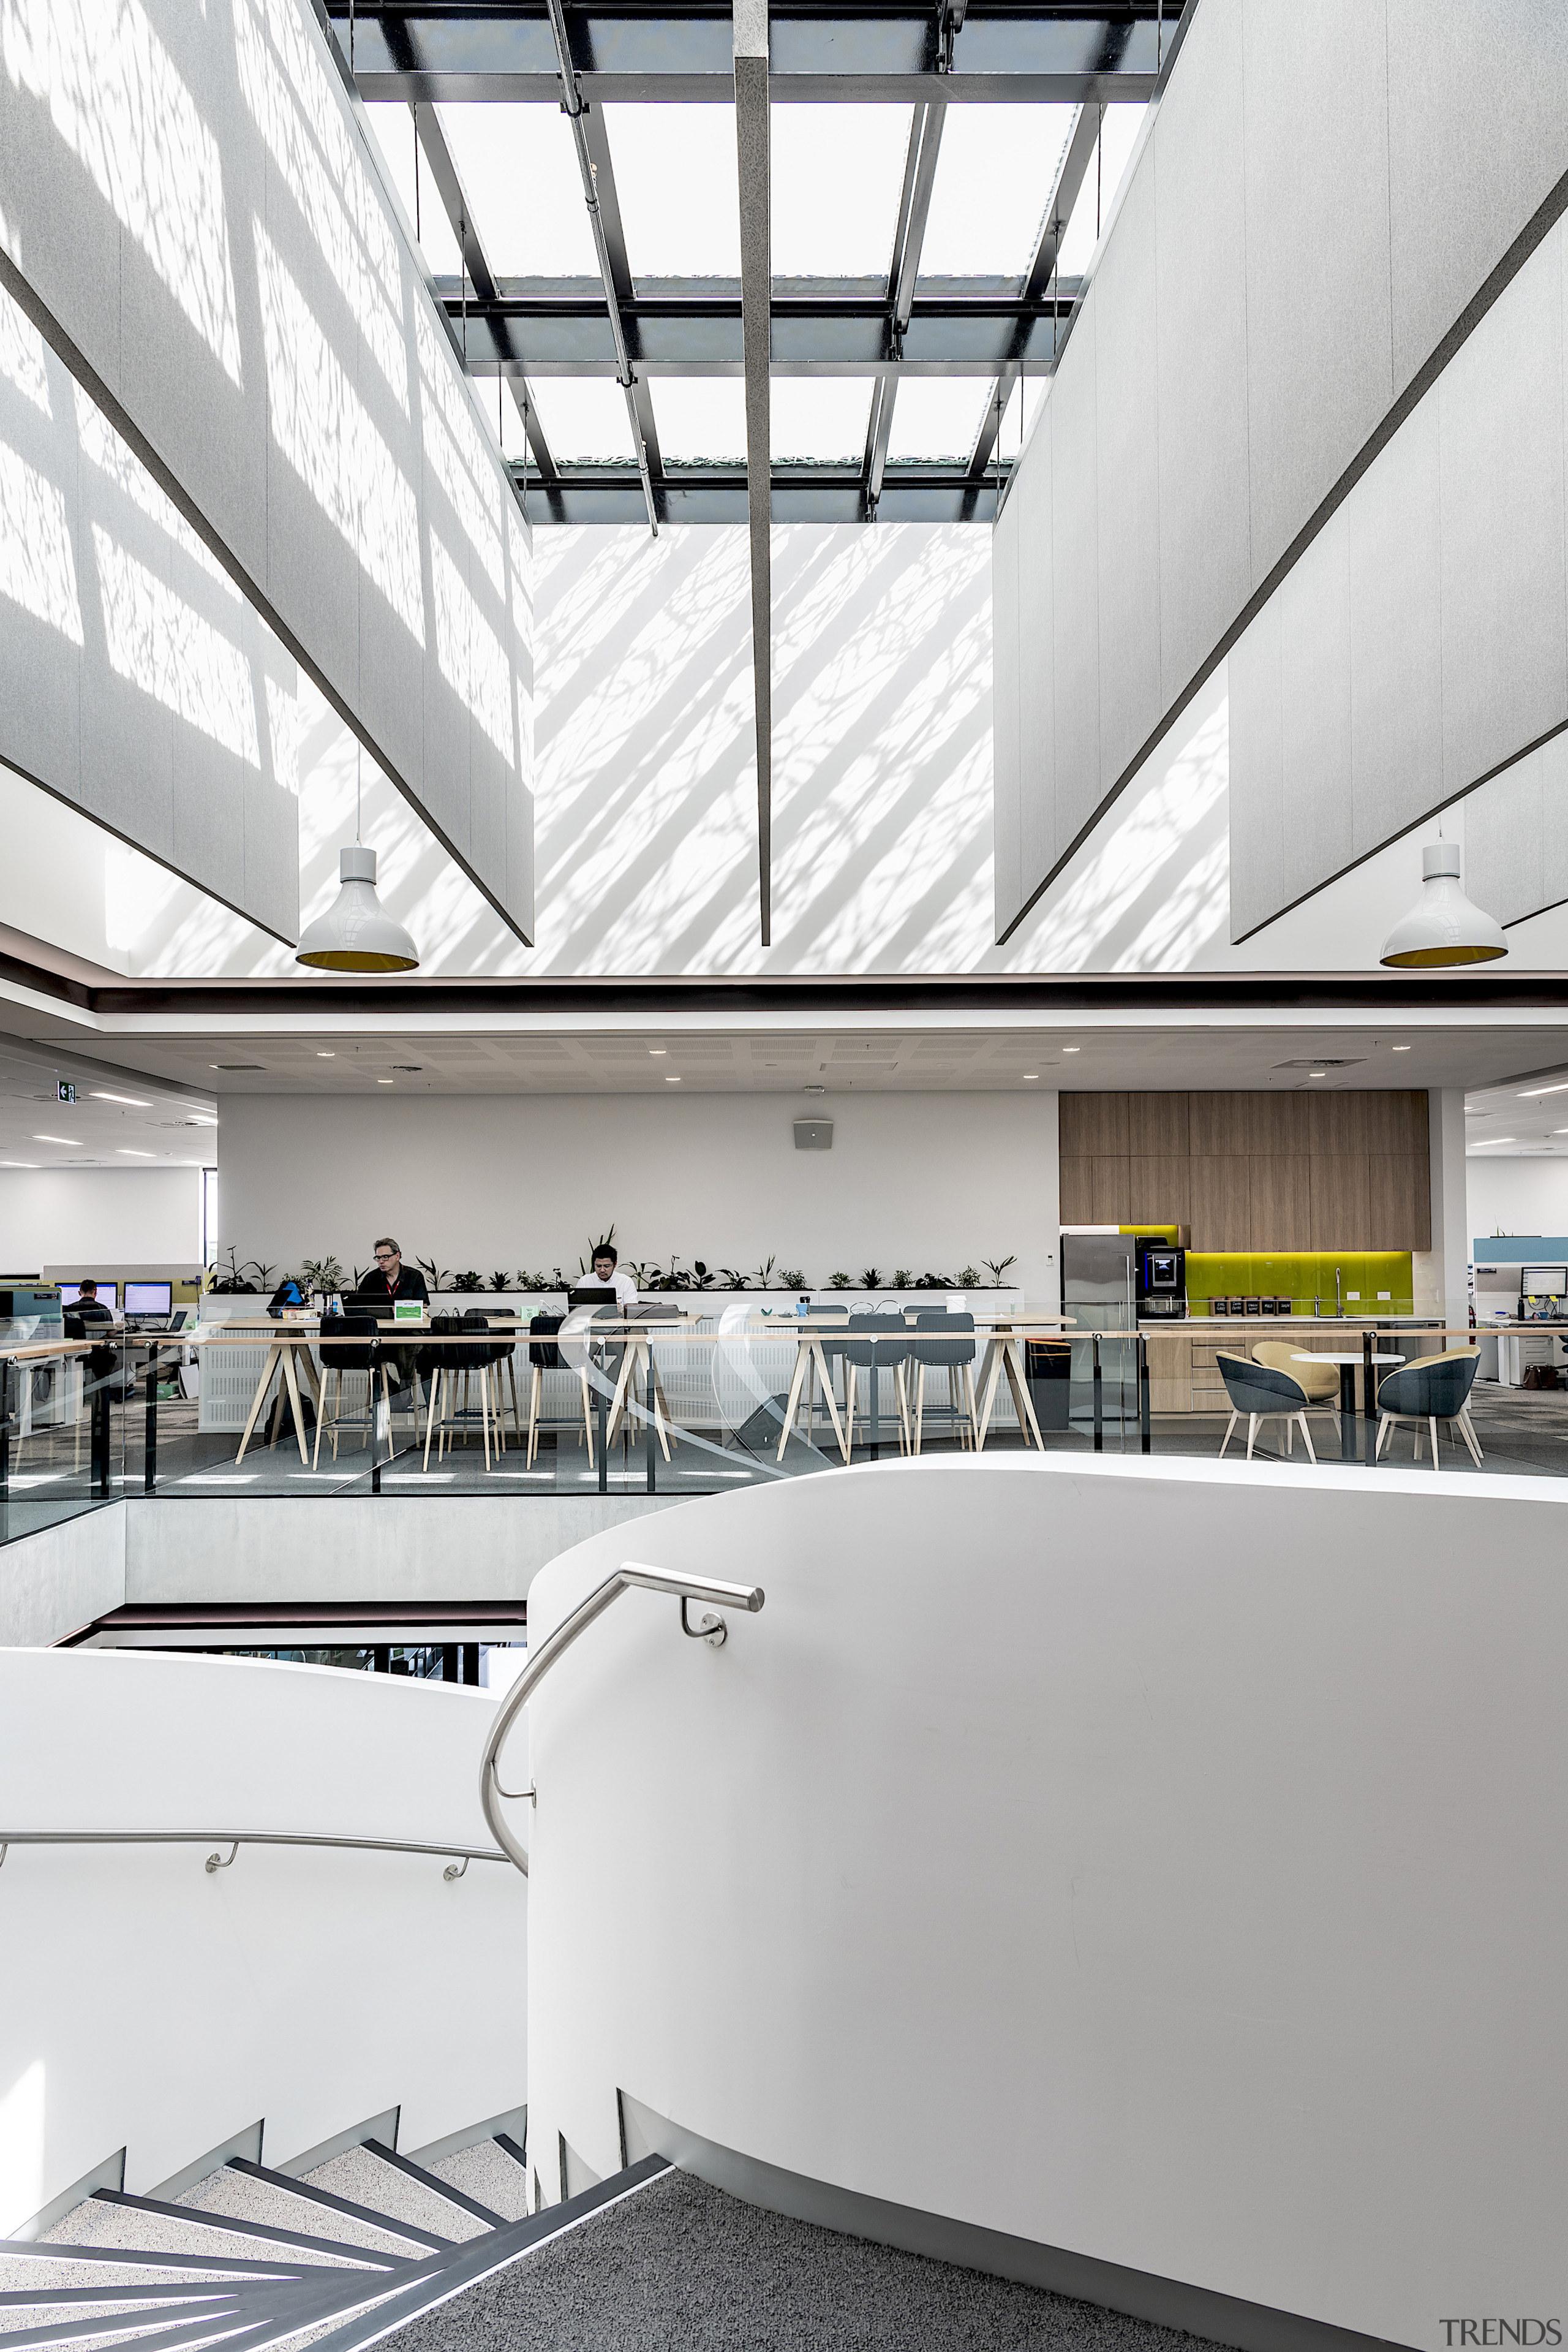 Giant panels hang midair in the atrium, providing